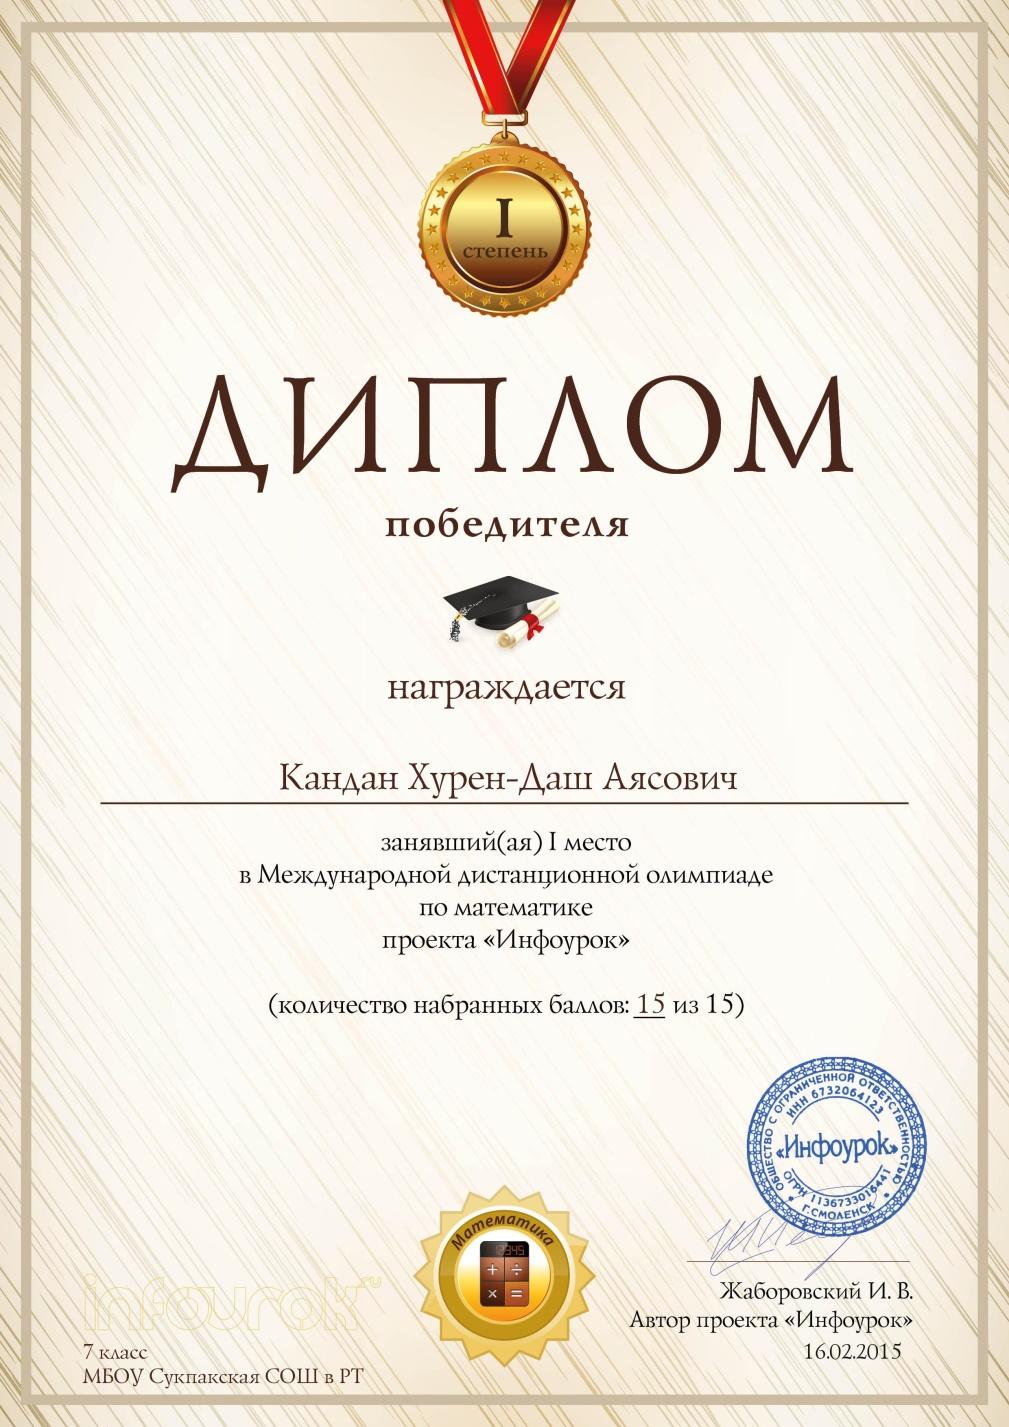 C:\Users\Снежана\Desktop\сертификаты инфоурок\олимпиада результат\format_A5_document_912071.jpg